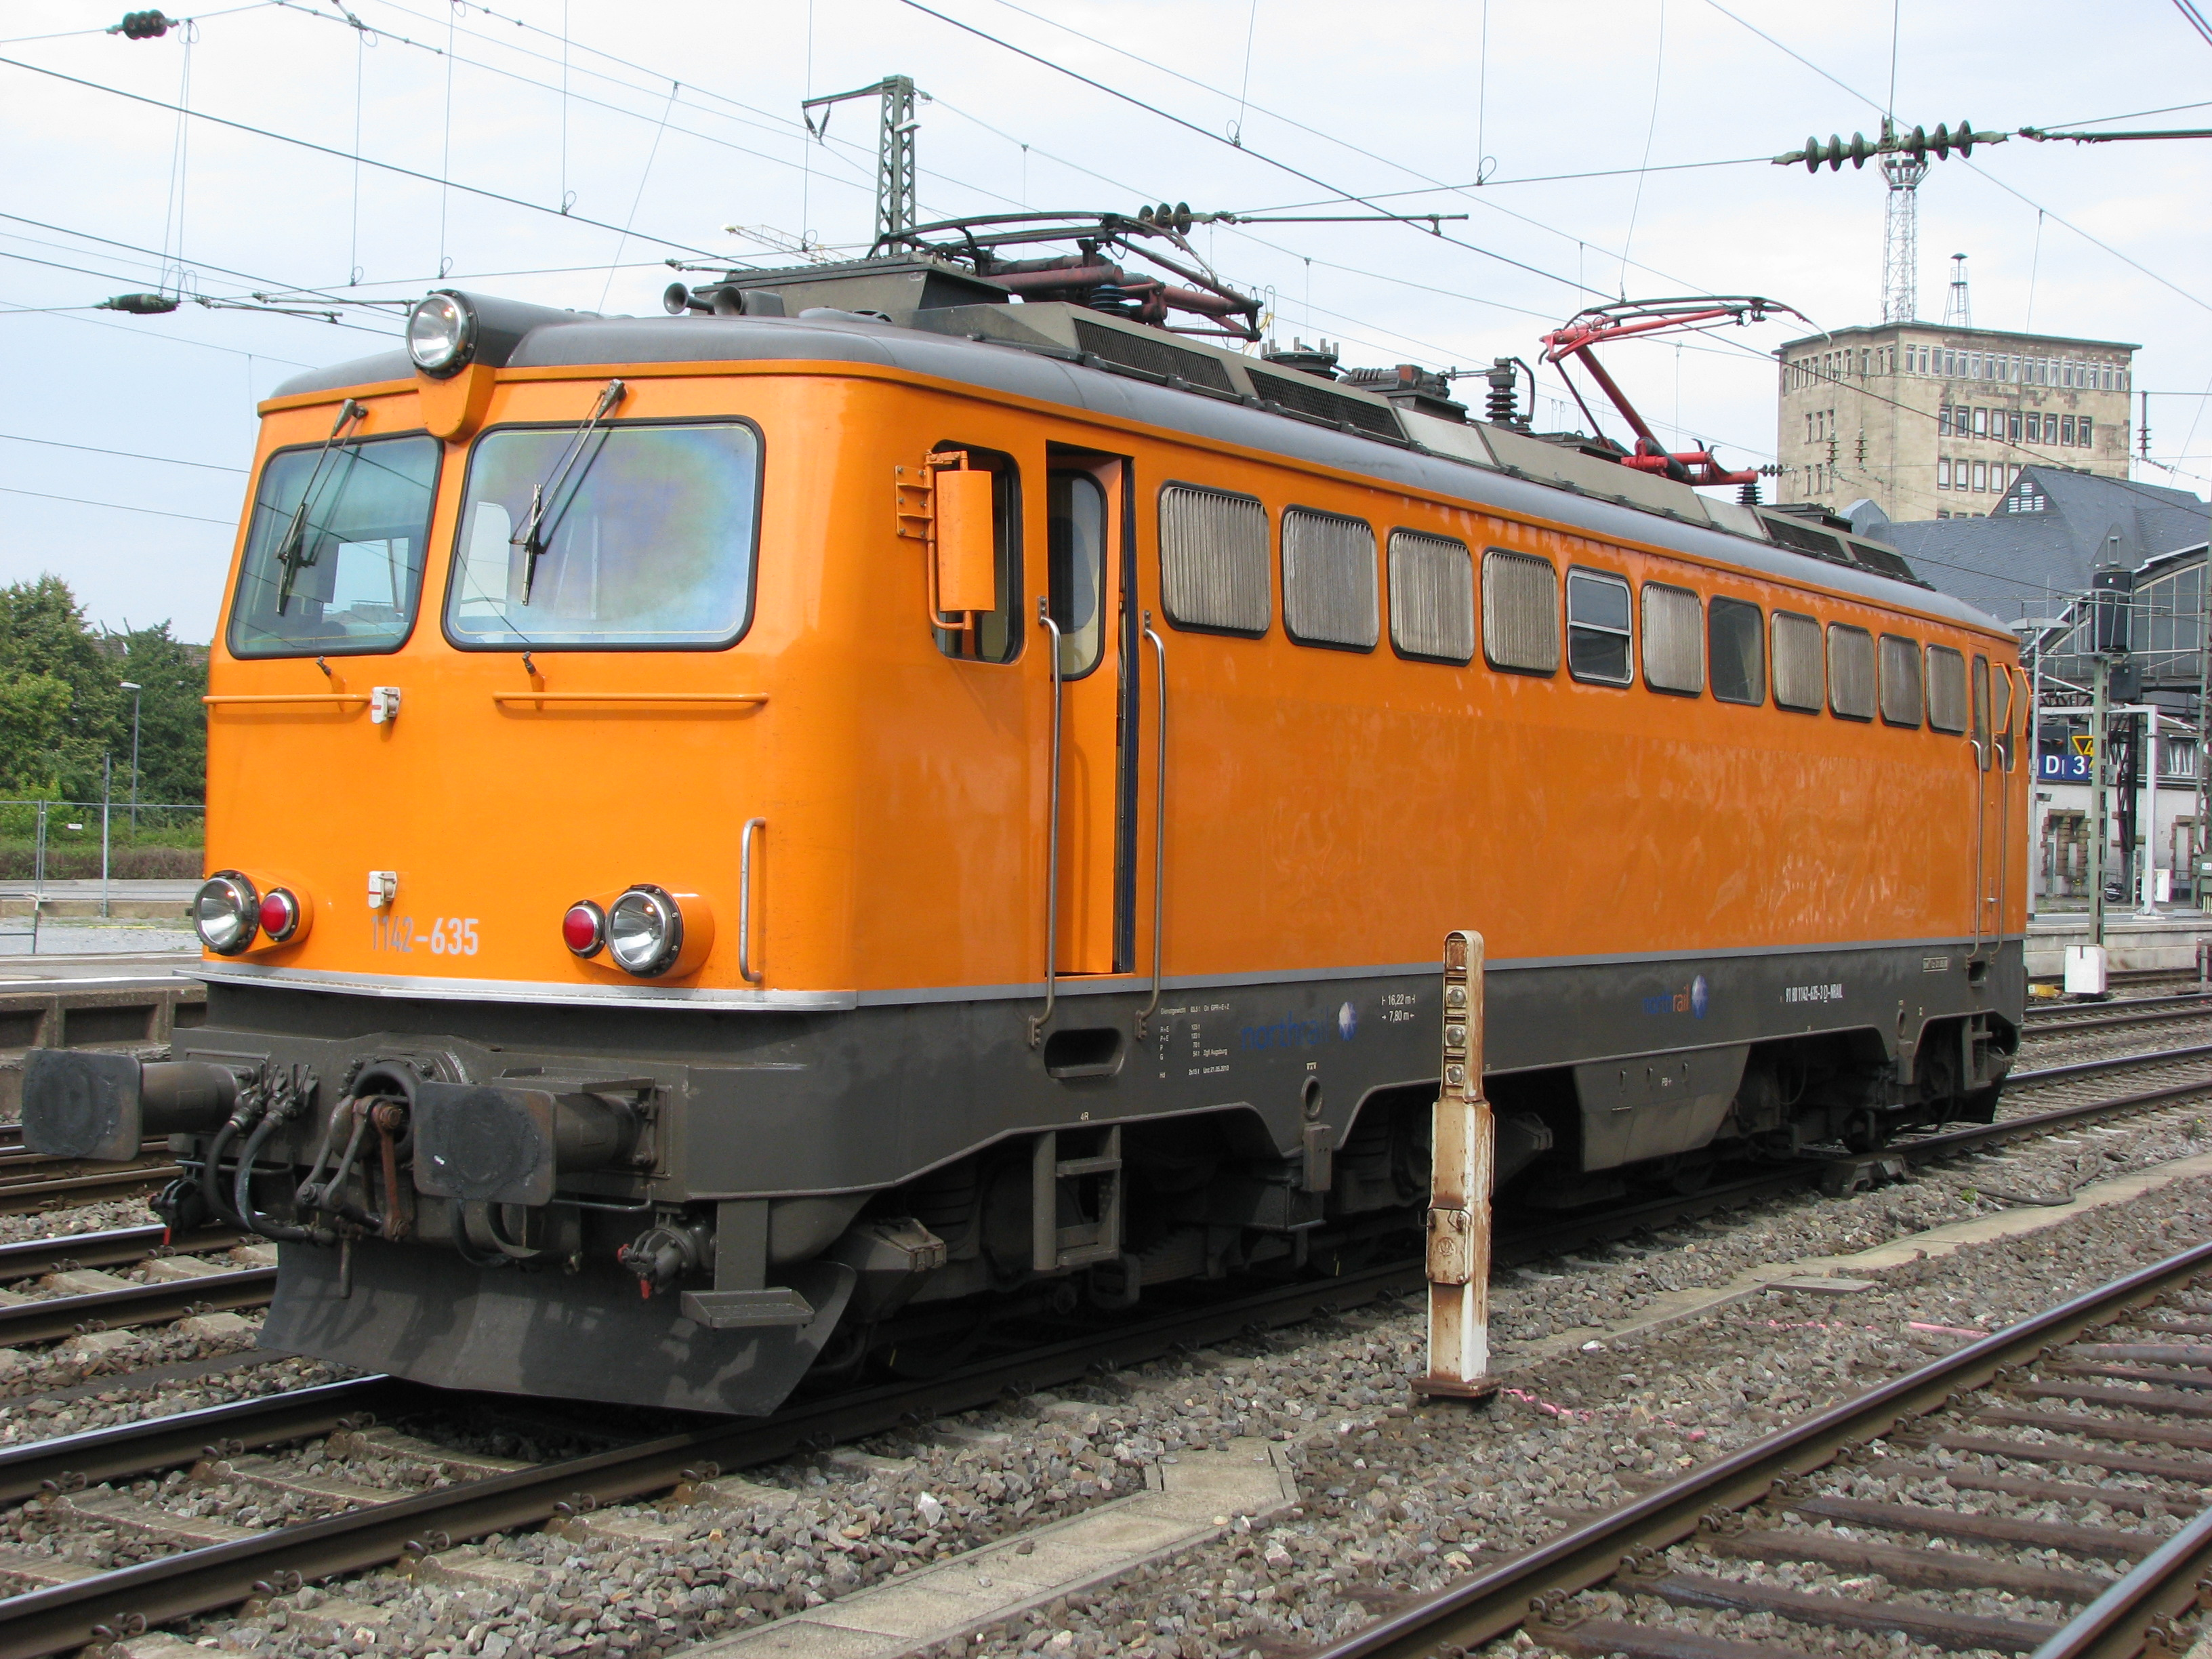 File:Northrail 1142-635.jpg